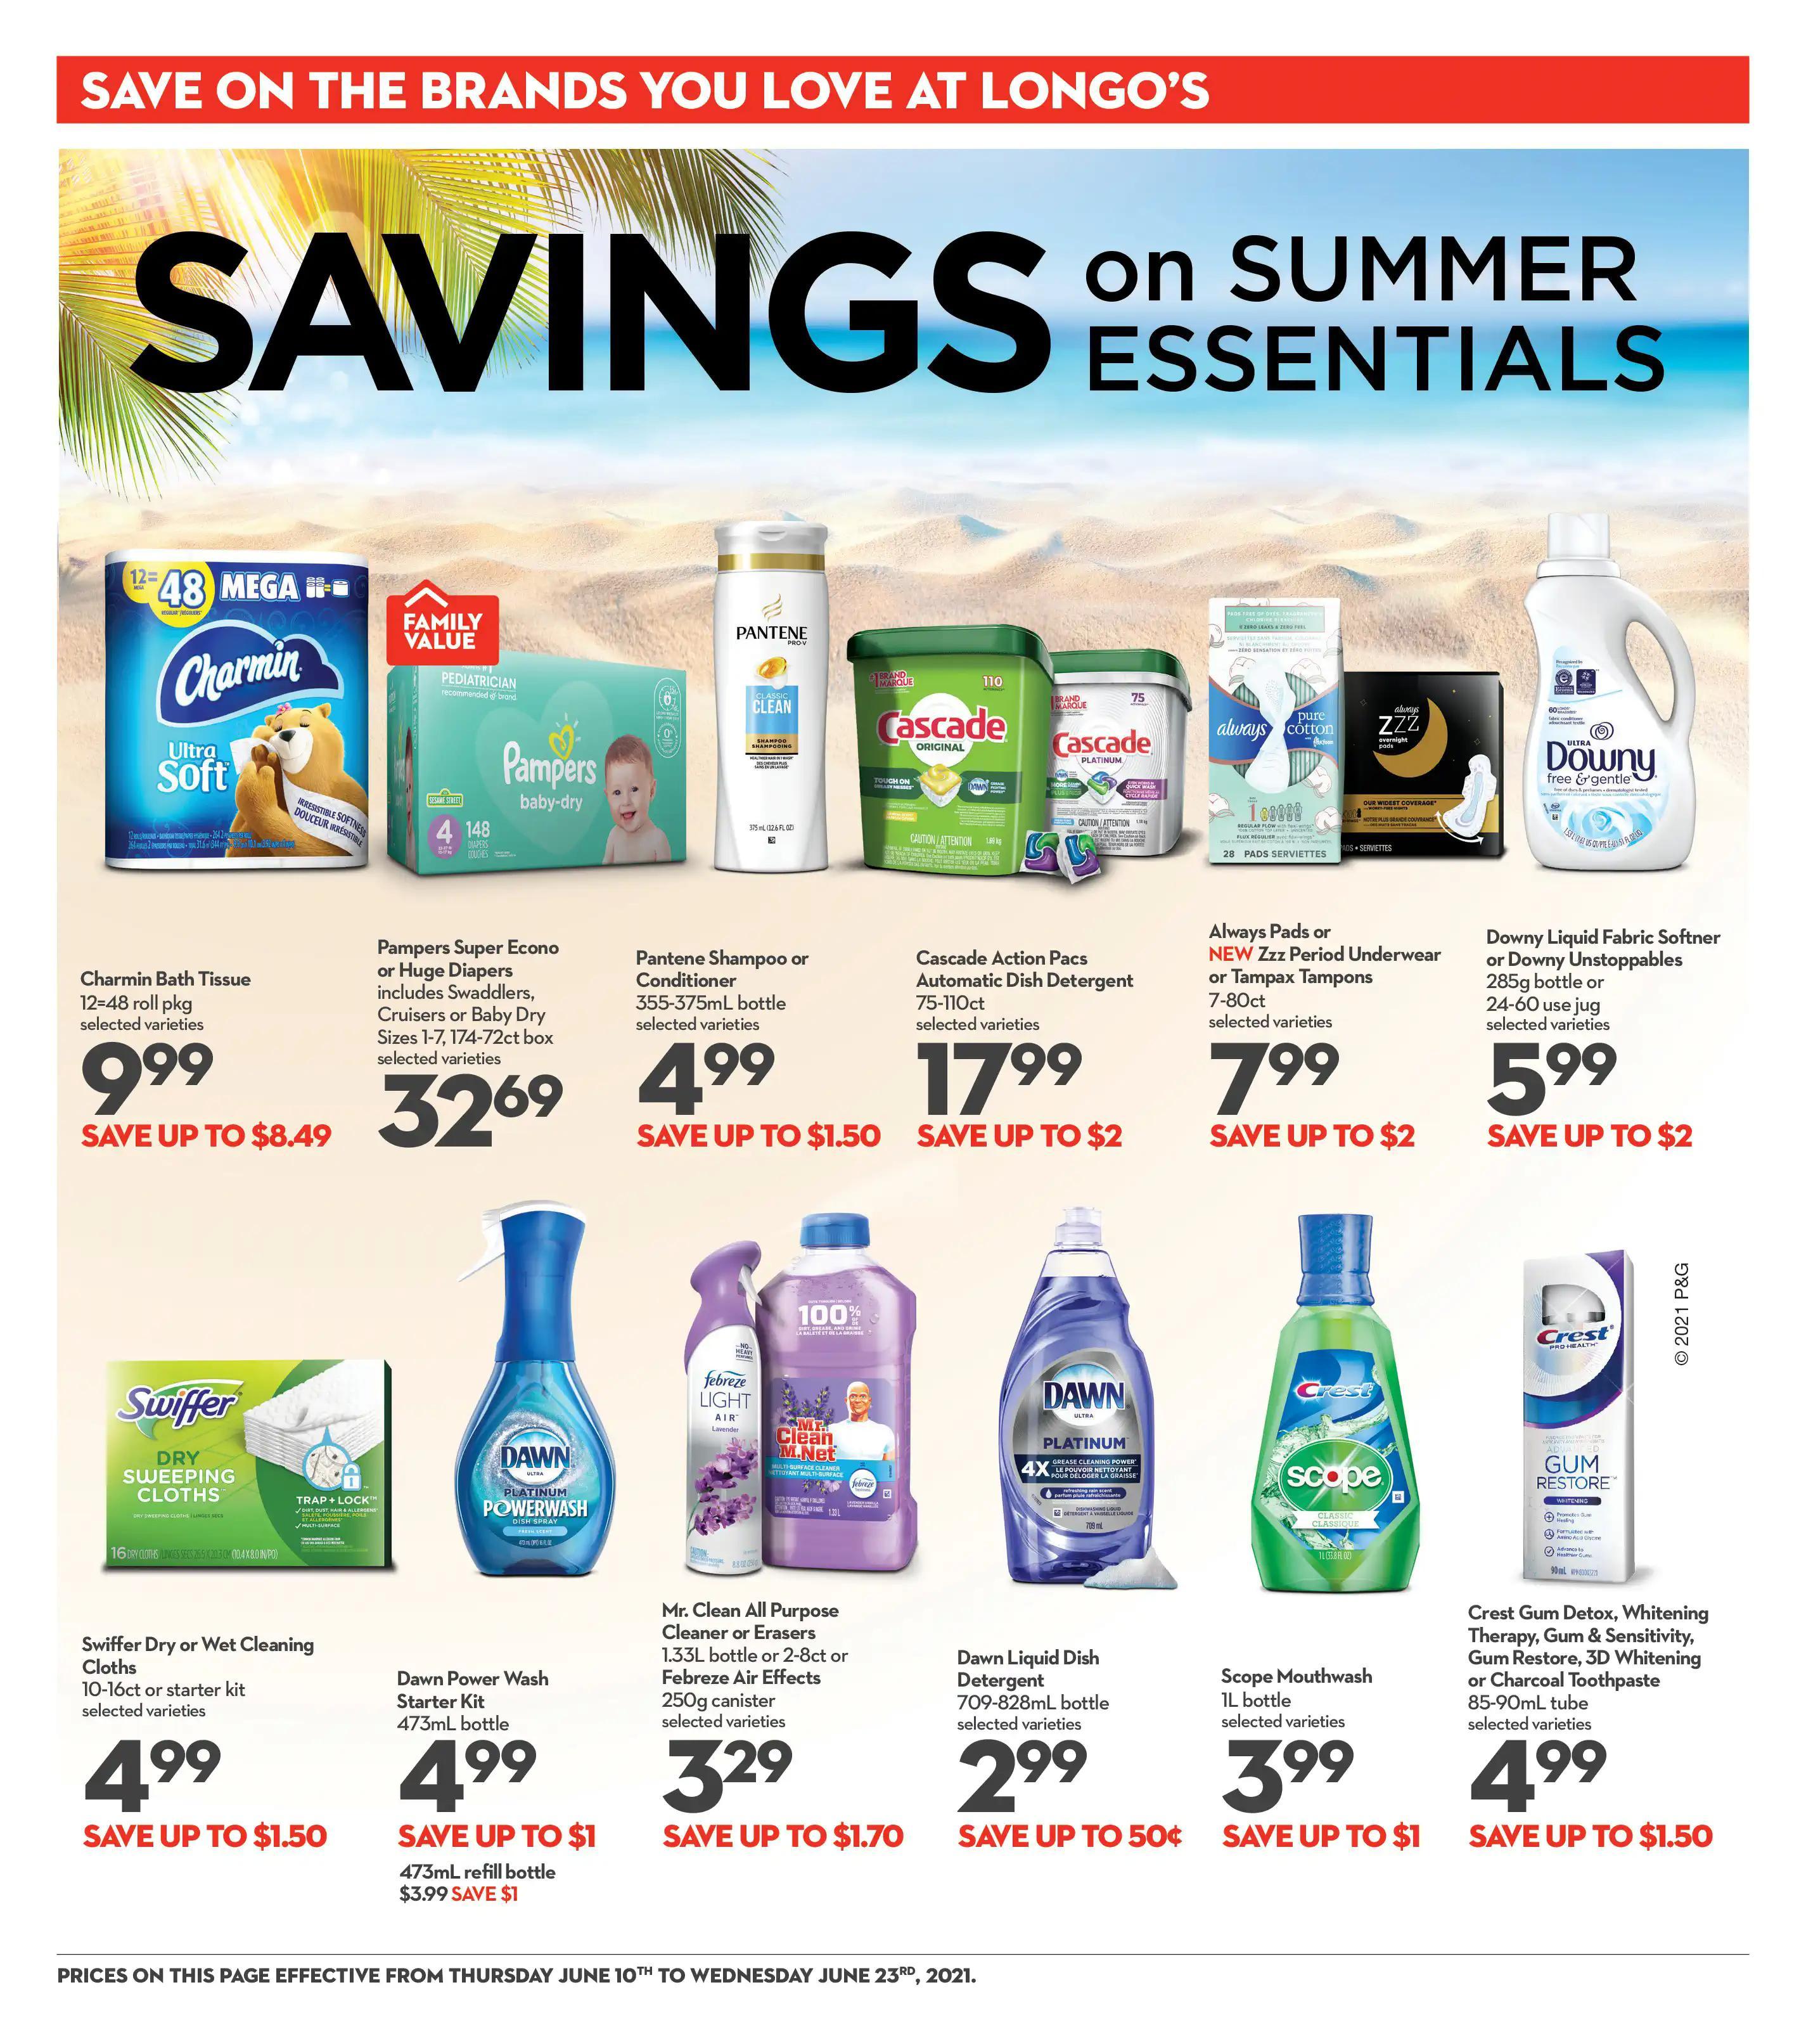 Longo's - 2 Weeks of Savings - Page 12